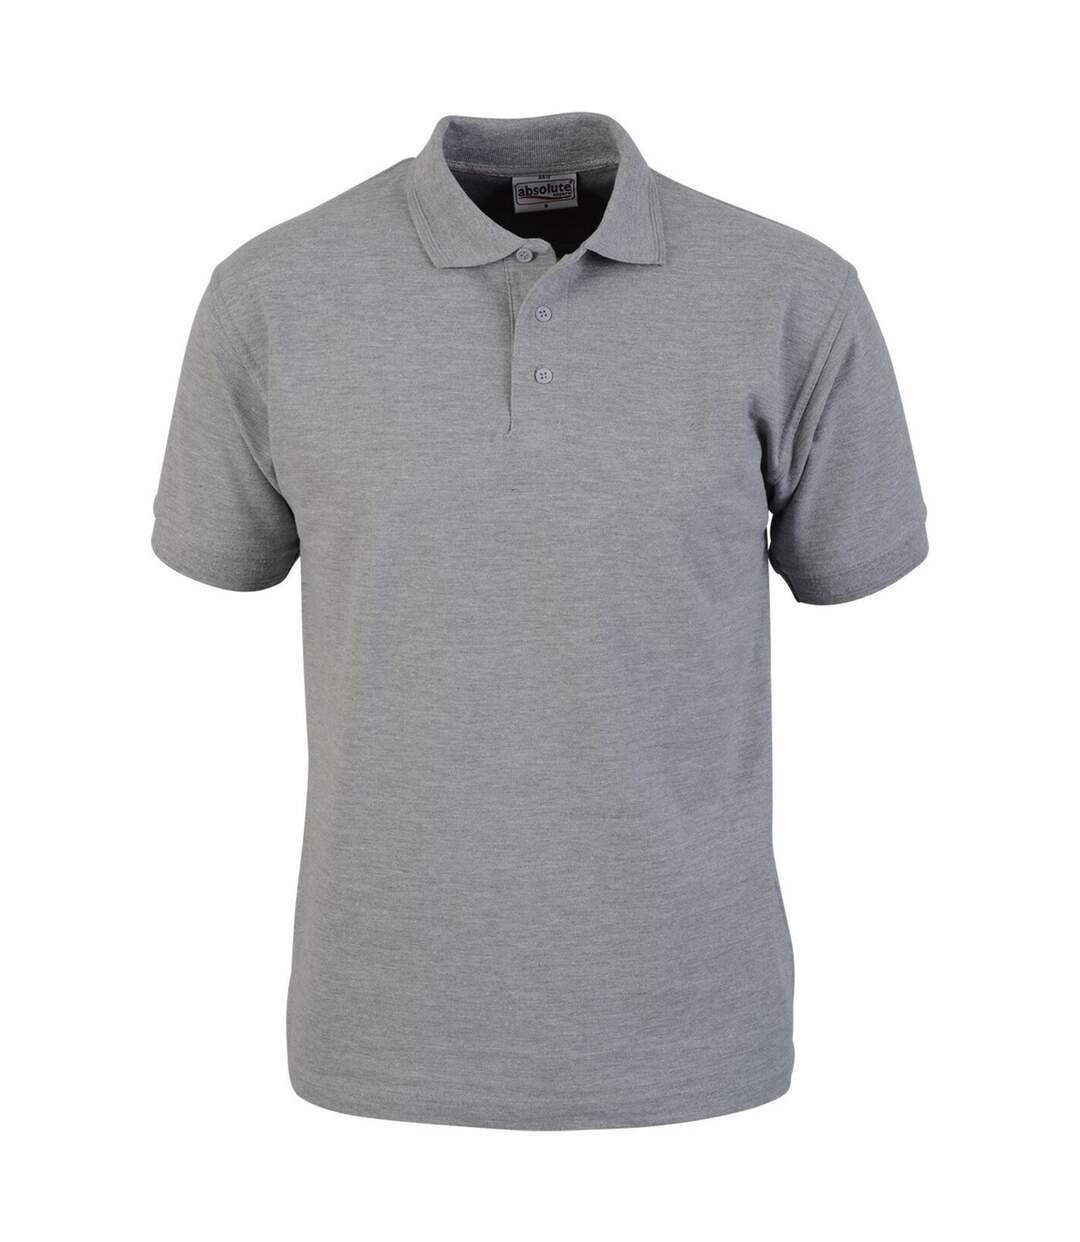 Absolute Apparel Mens Precision Polo (Sport Grey) - UTAB105